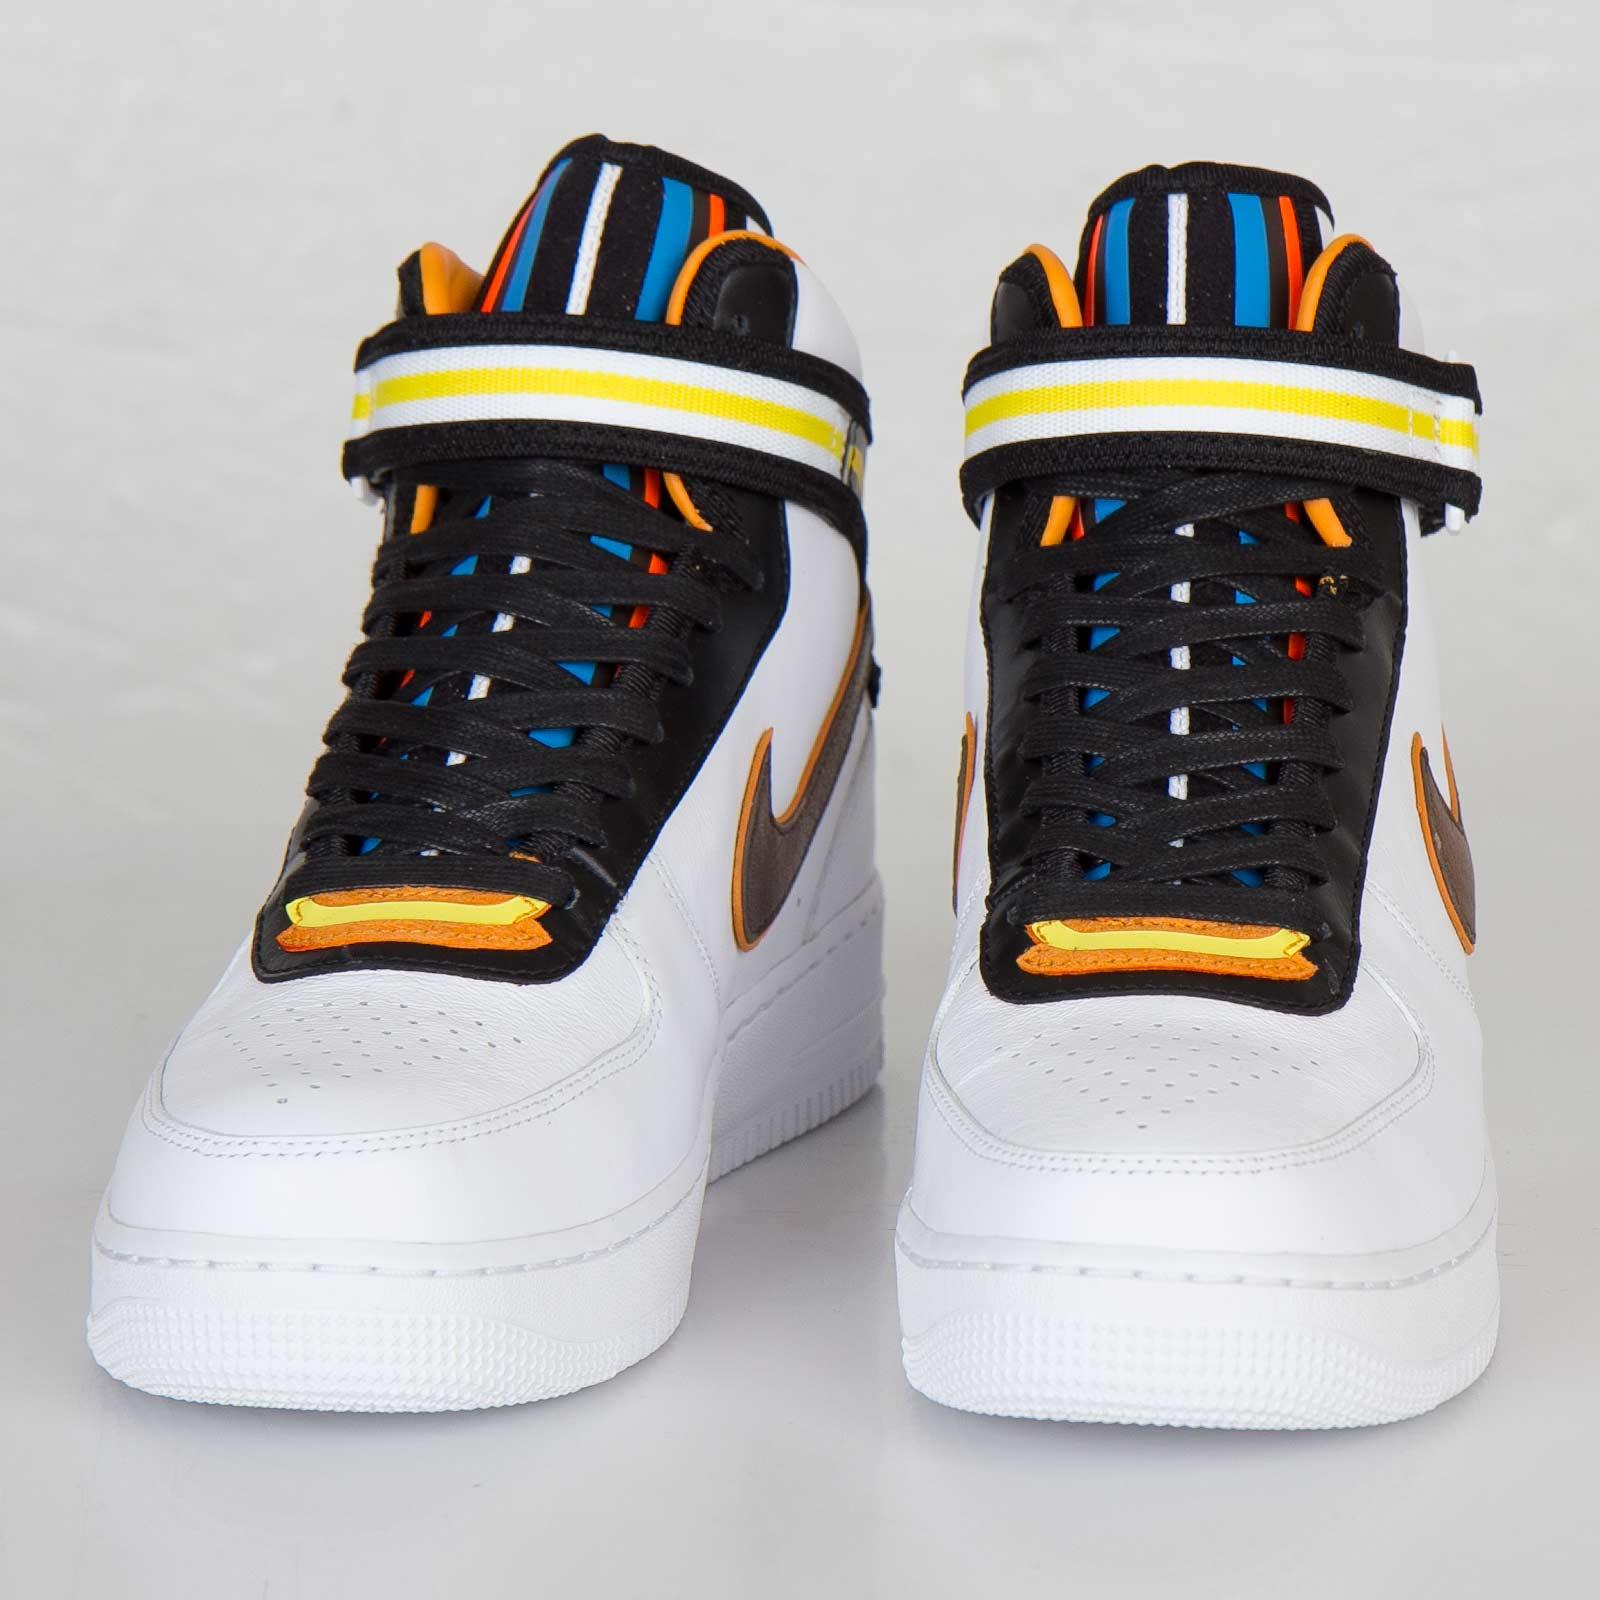 factory authentic c8035 568f1 Nike Air Force 1 Mid SP   Tisci - 677130-120 - Sneakersnstuff   sneakers    streetwear online since 1999